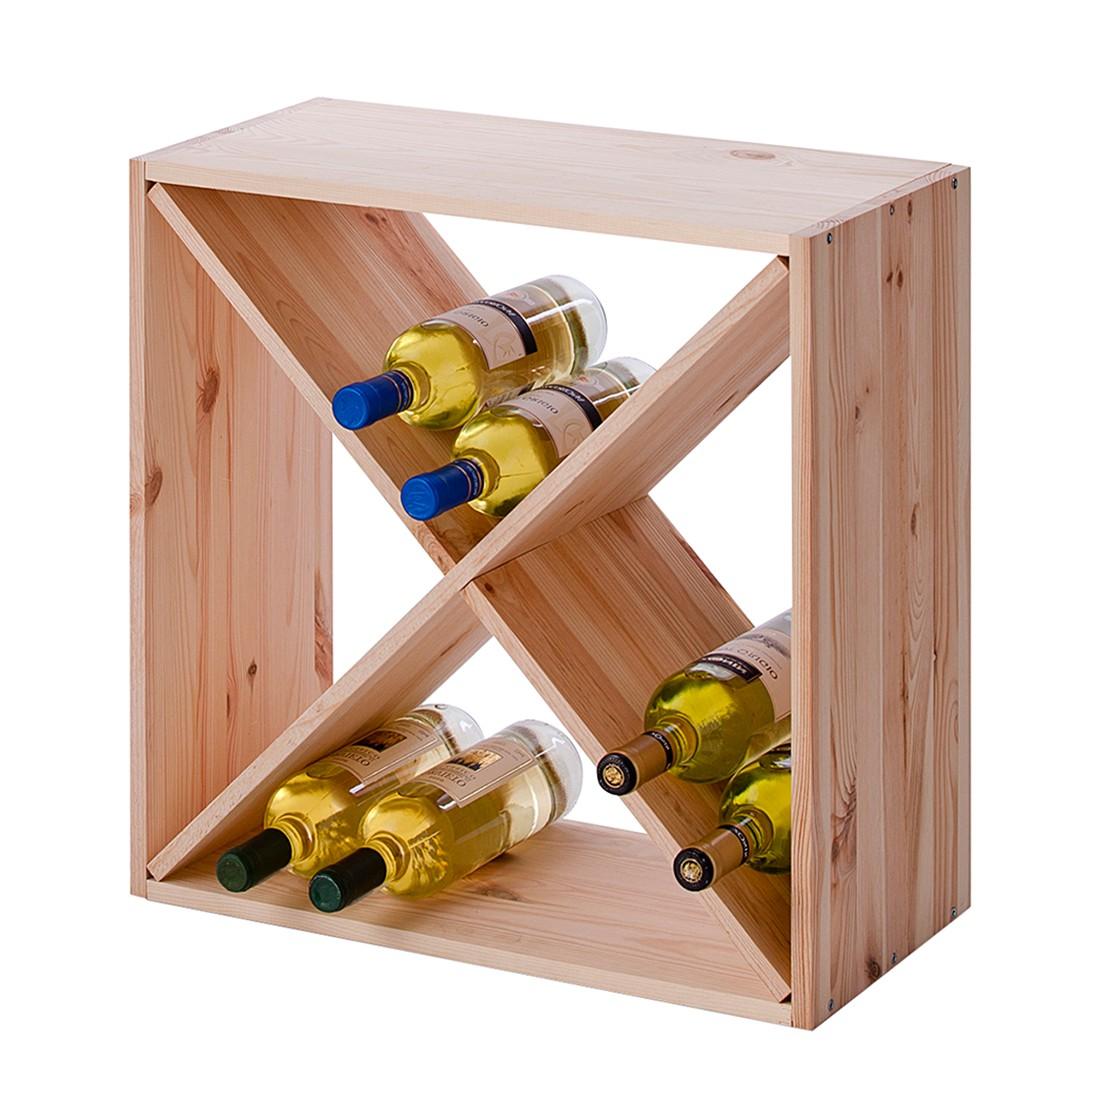 Dispensa porta bottiglie di vino bendik ii - legno massello abete rosso naturale, Zeller